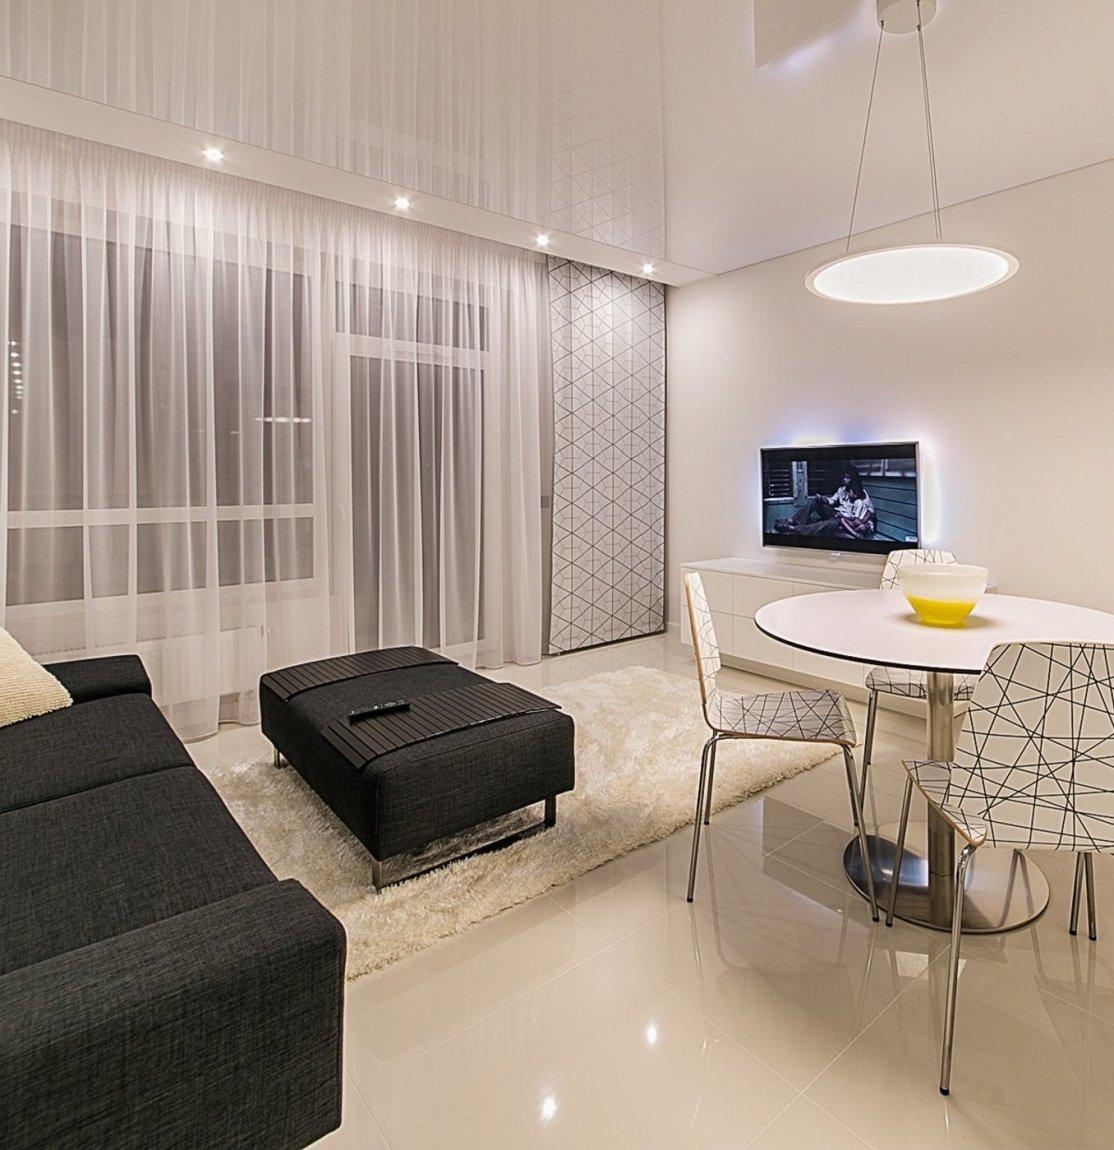 маленькая квартира дизайн интерьера